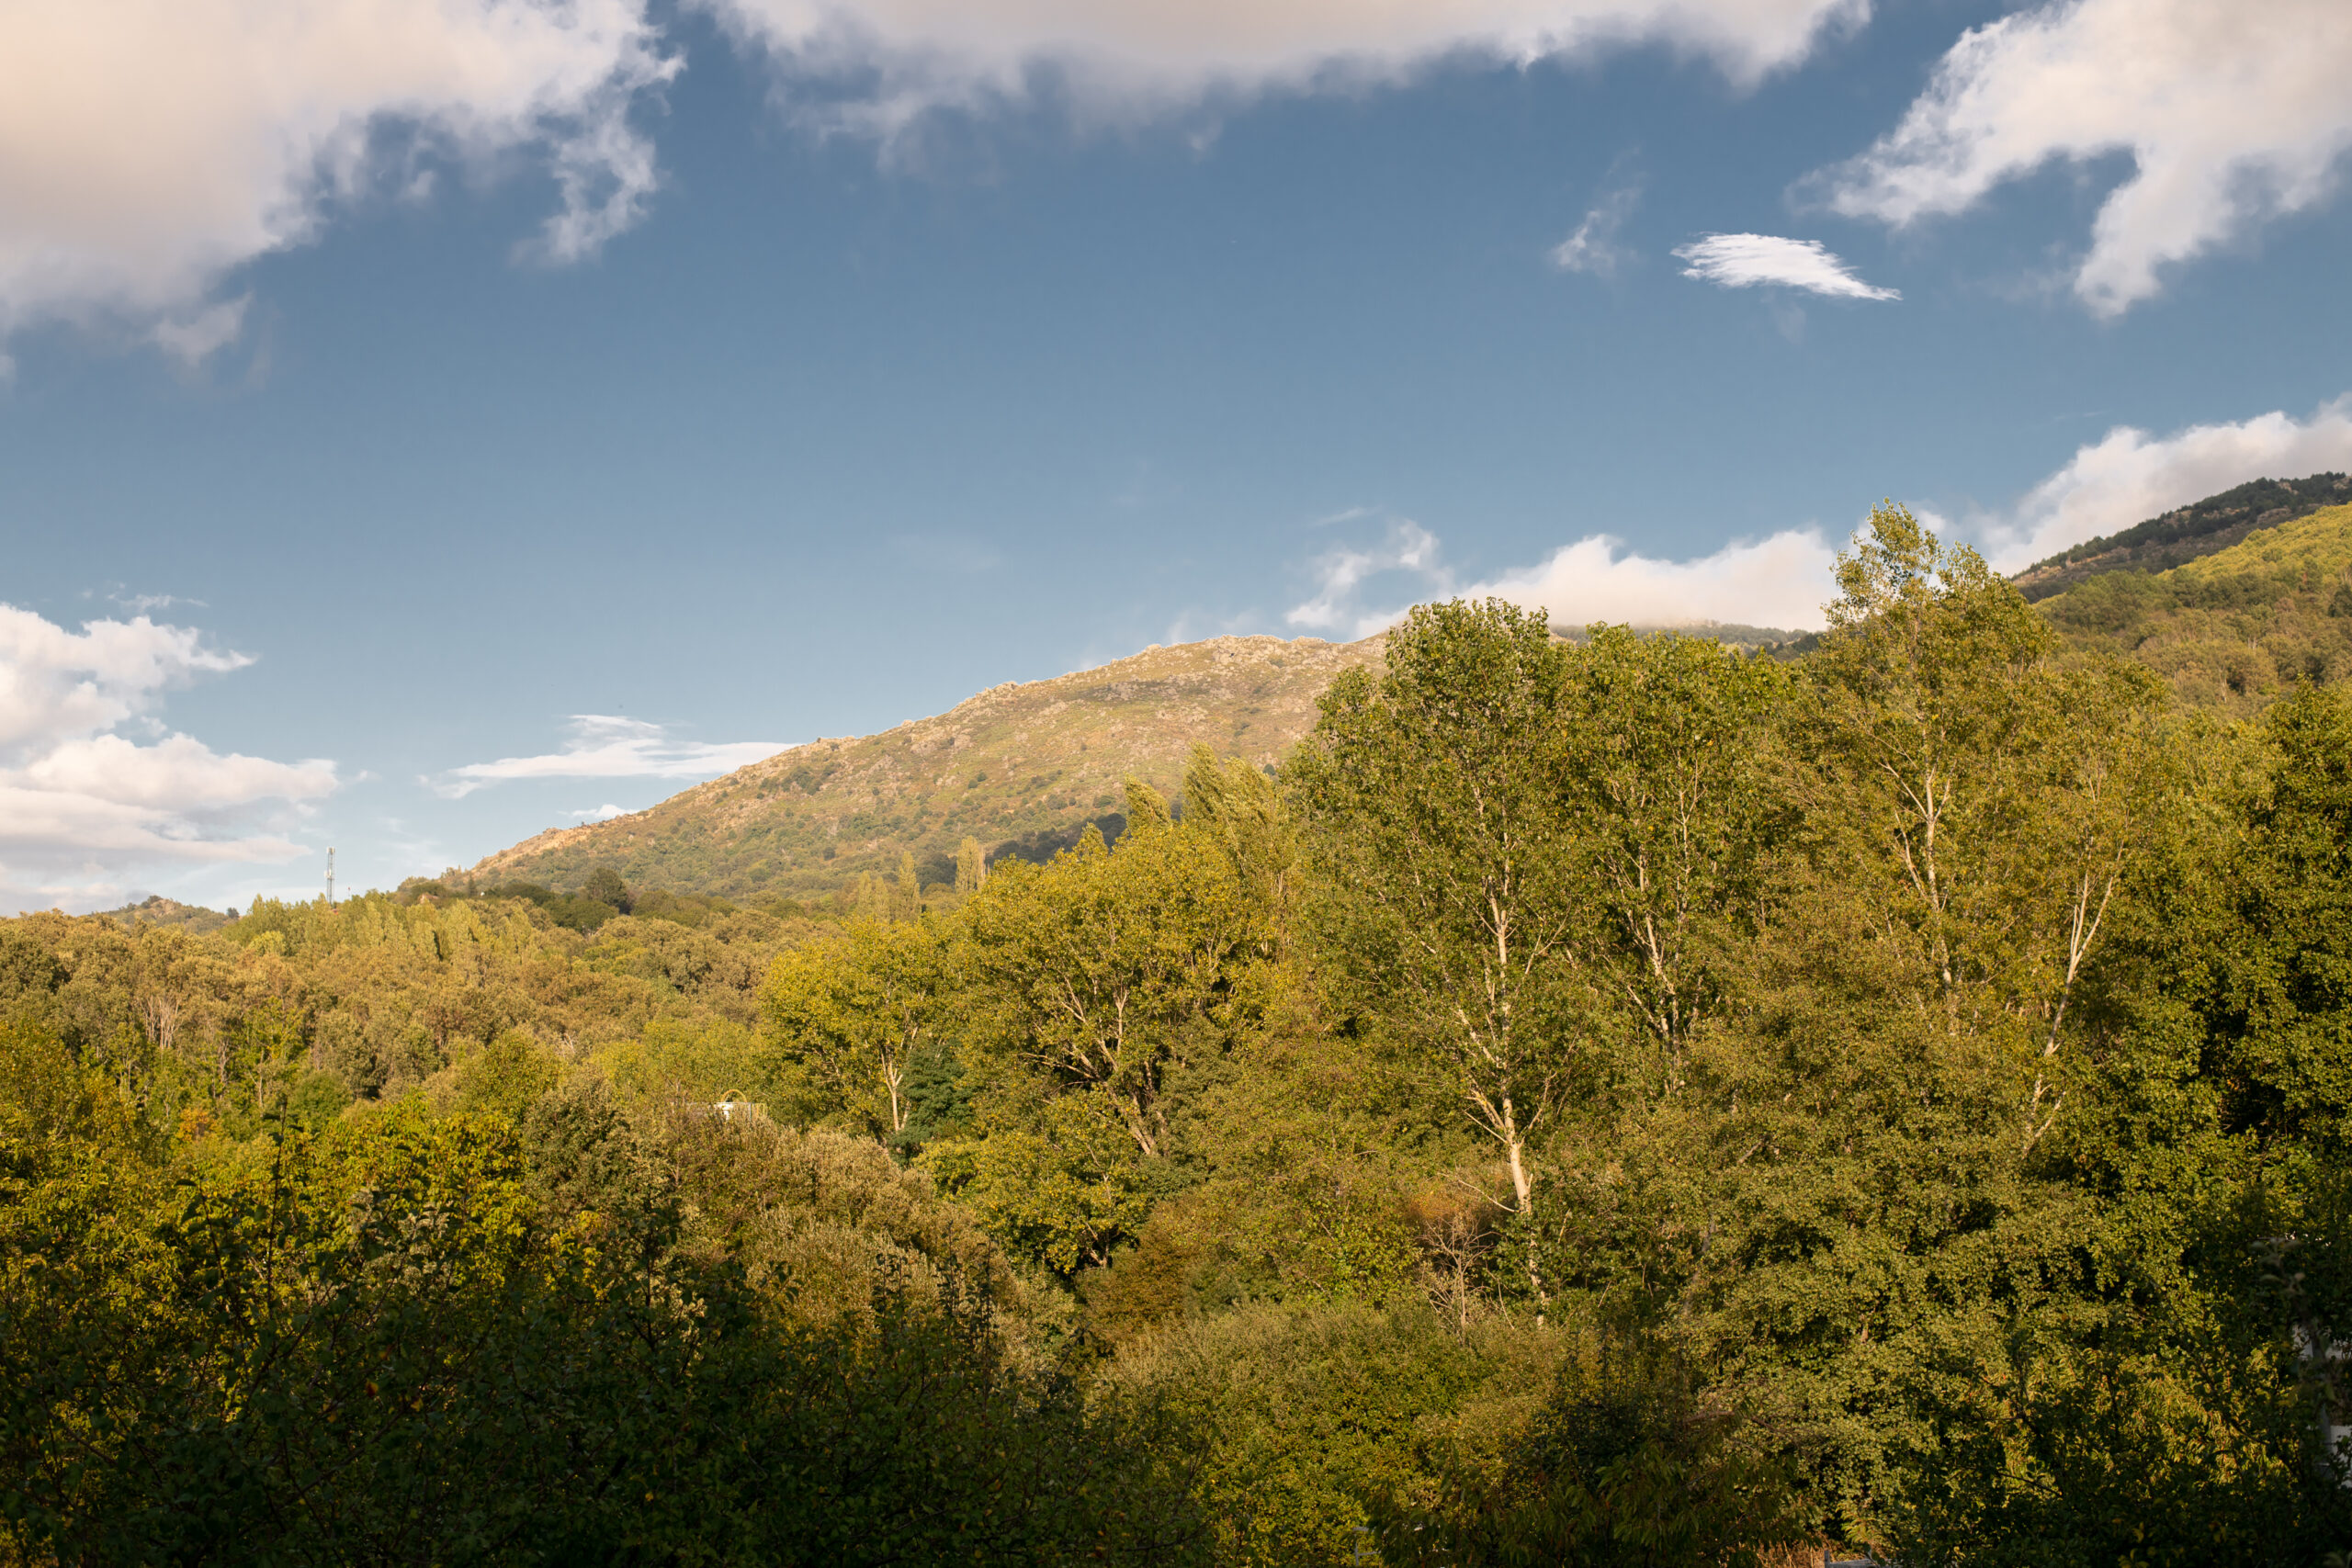 paisajes de naturaleza por el camino de la plata